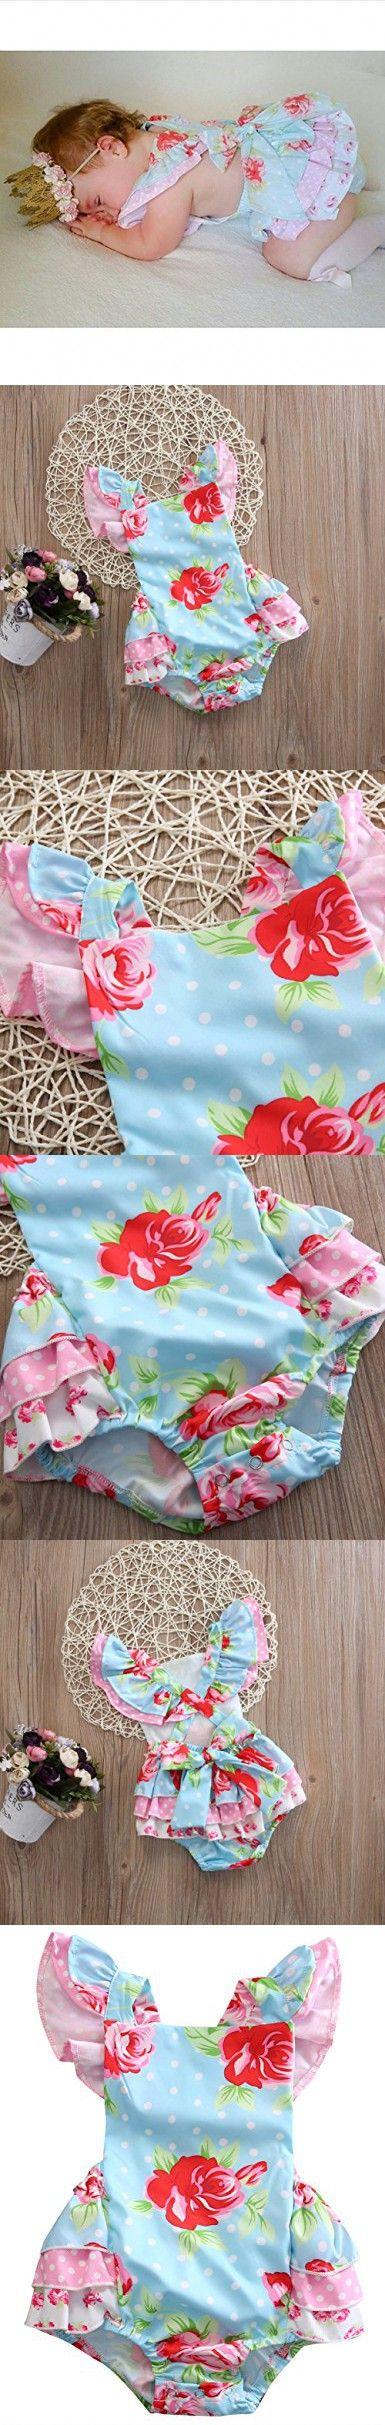 Baby Girls' Full Flower Print Buttons Ruffles Romper Bodysuit with Headband (80(6-12M), Blue(no headband))